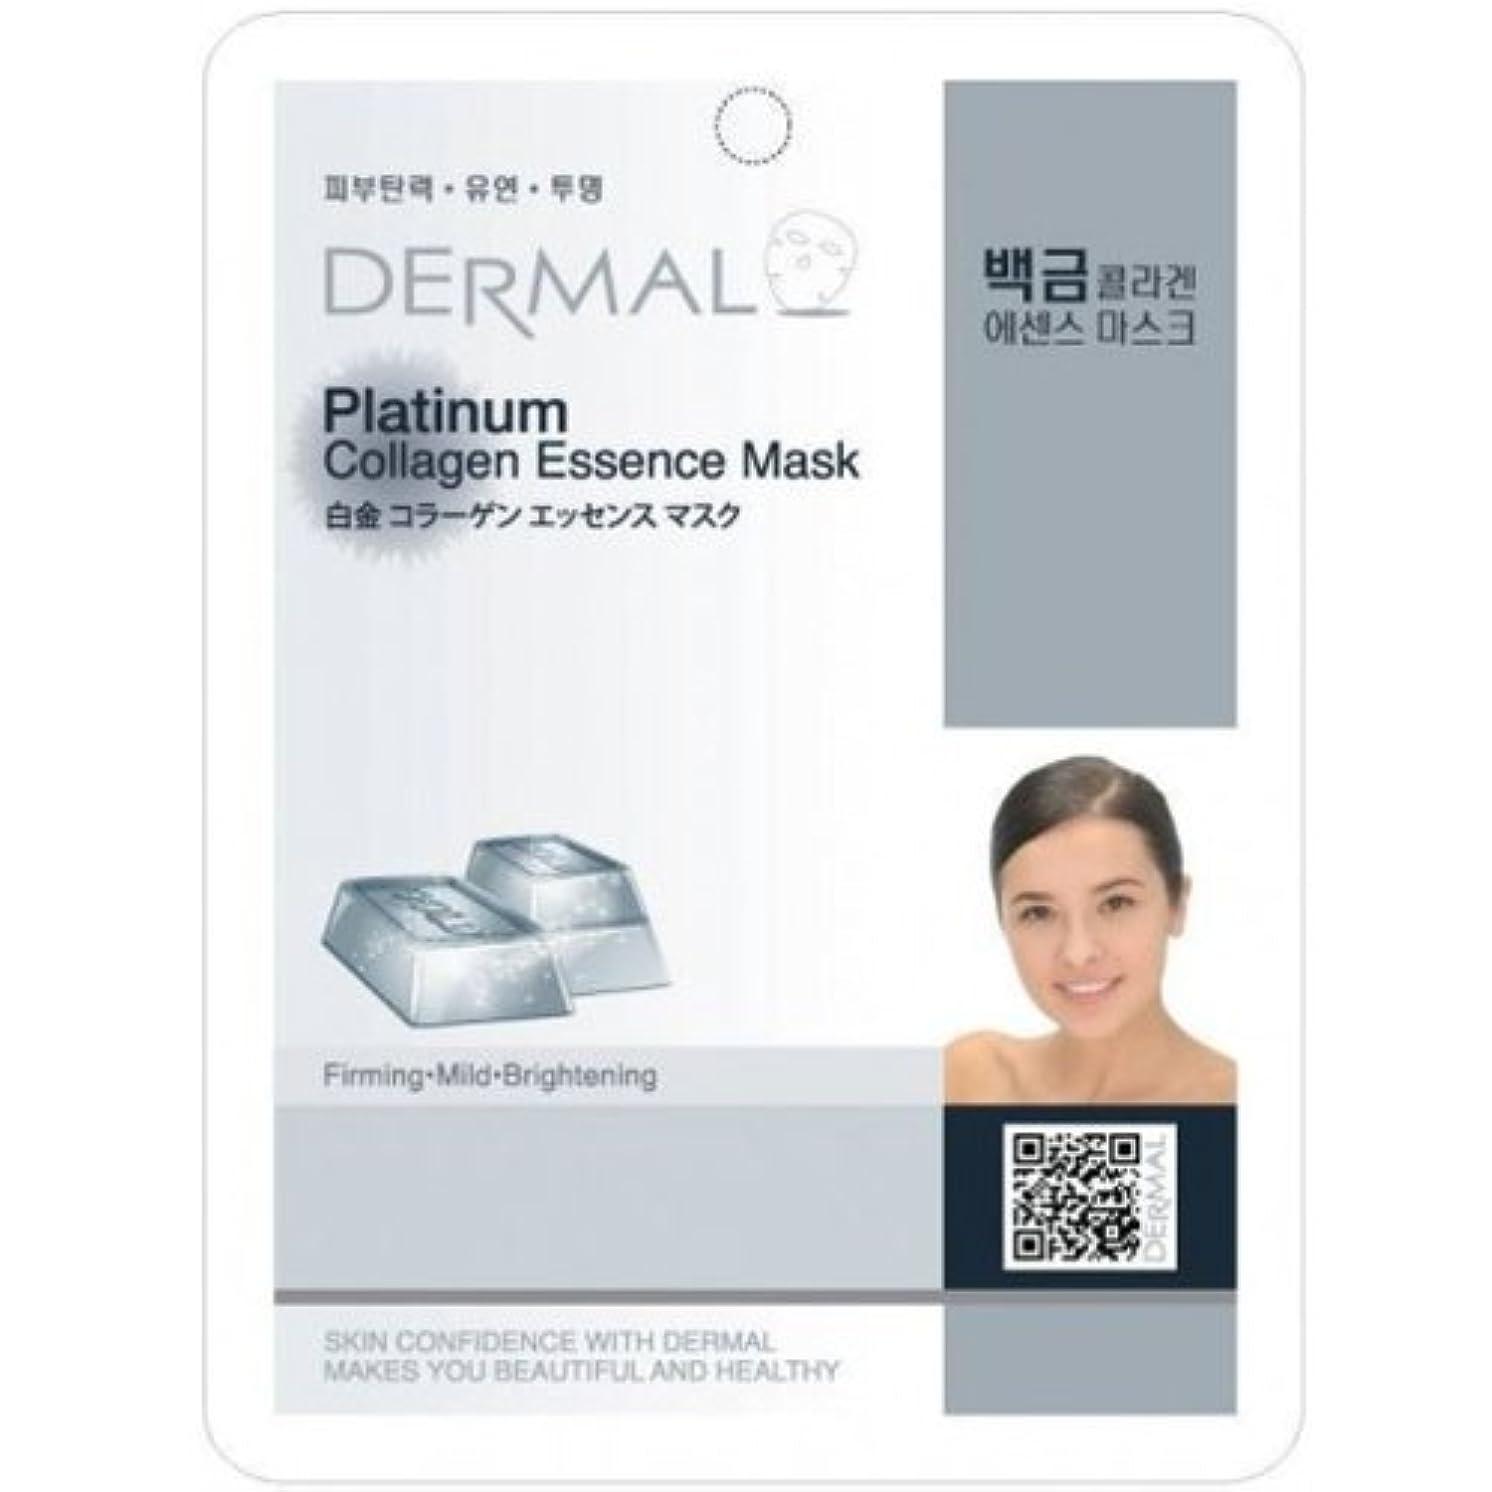 【DERMAL】ダーマル シートマスク 白金 10枚セット/保湿/フェイスマスク/フェイスパック/マスクパック/韓国コスメ [メール便]